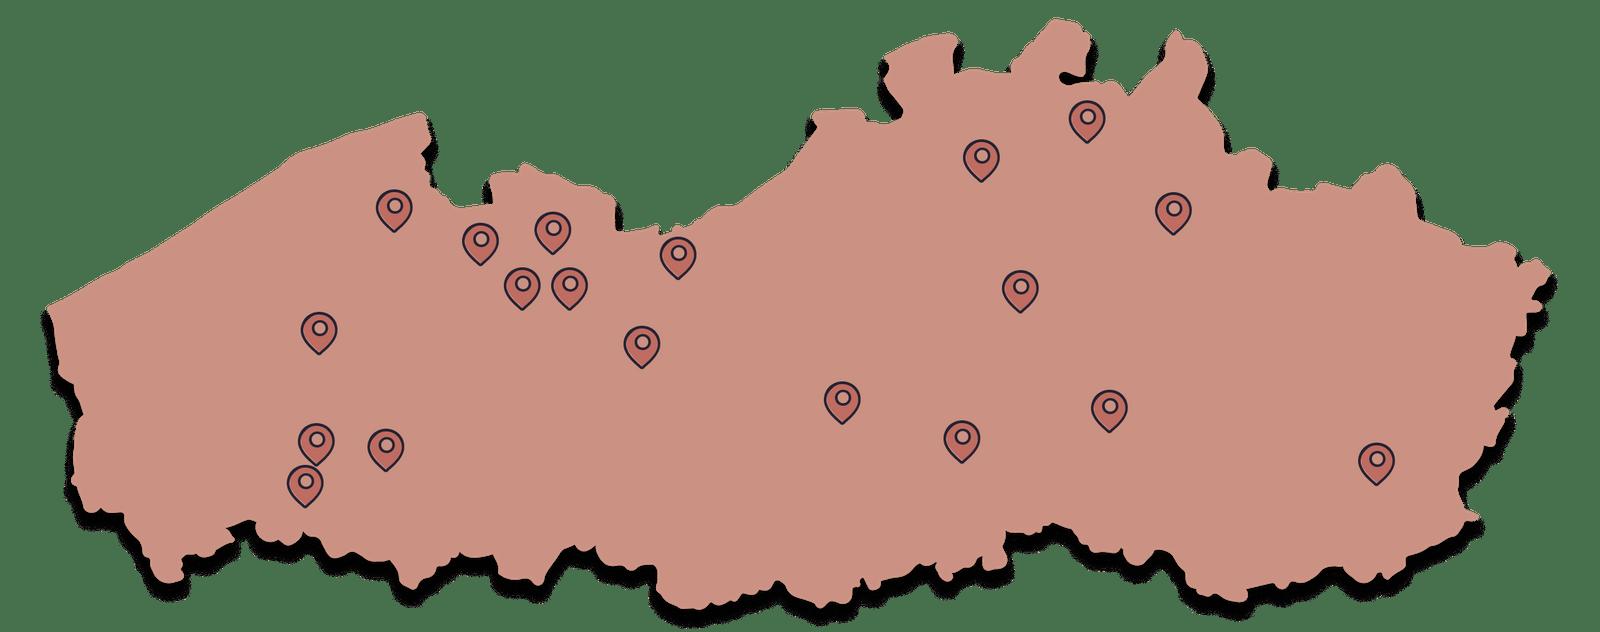 Kaart vrouwenclubs België